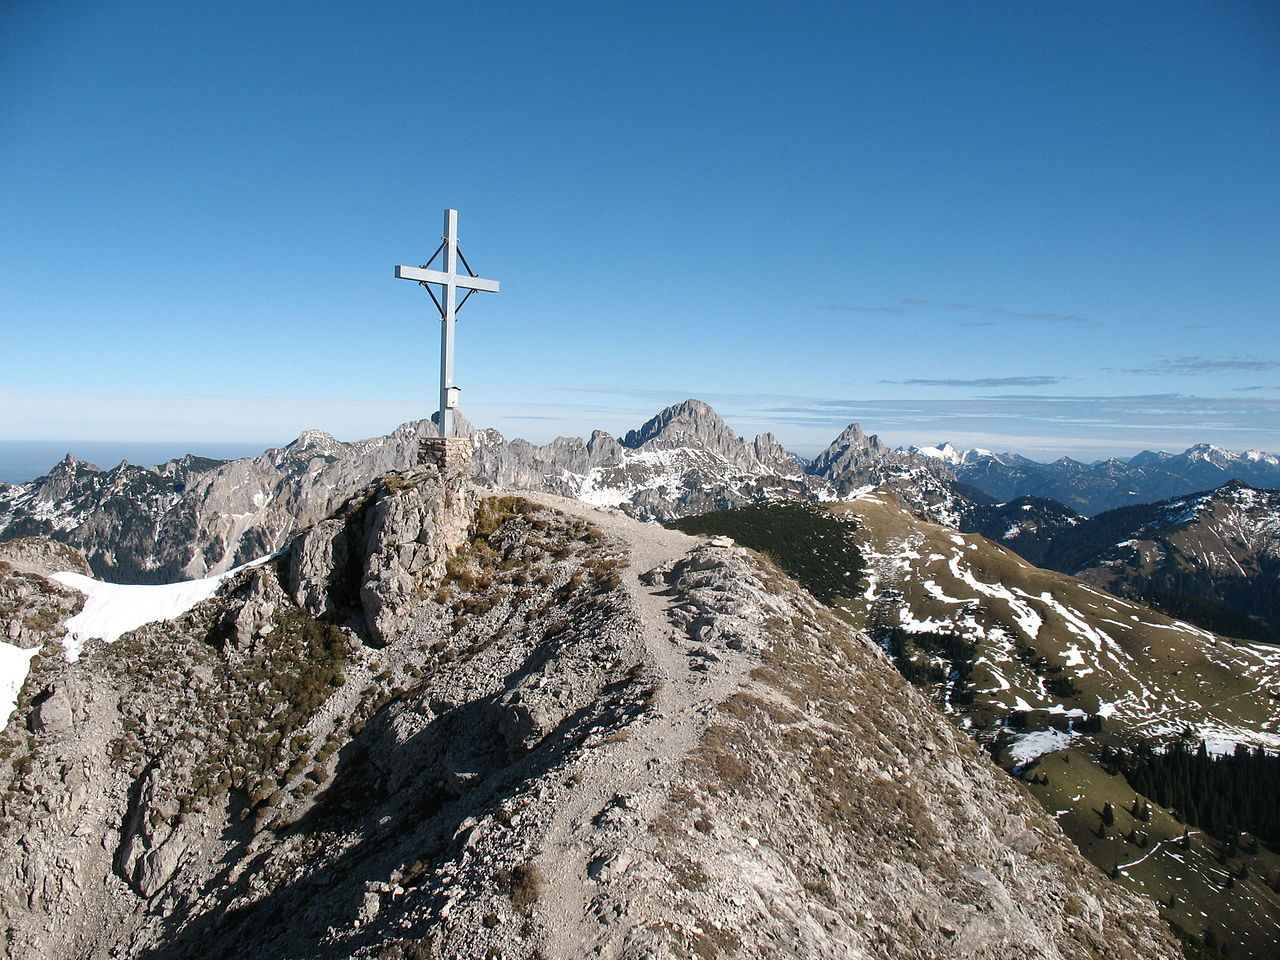 File:Litnisschrofen Gipfel.JPG.